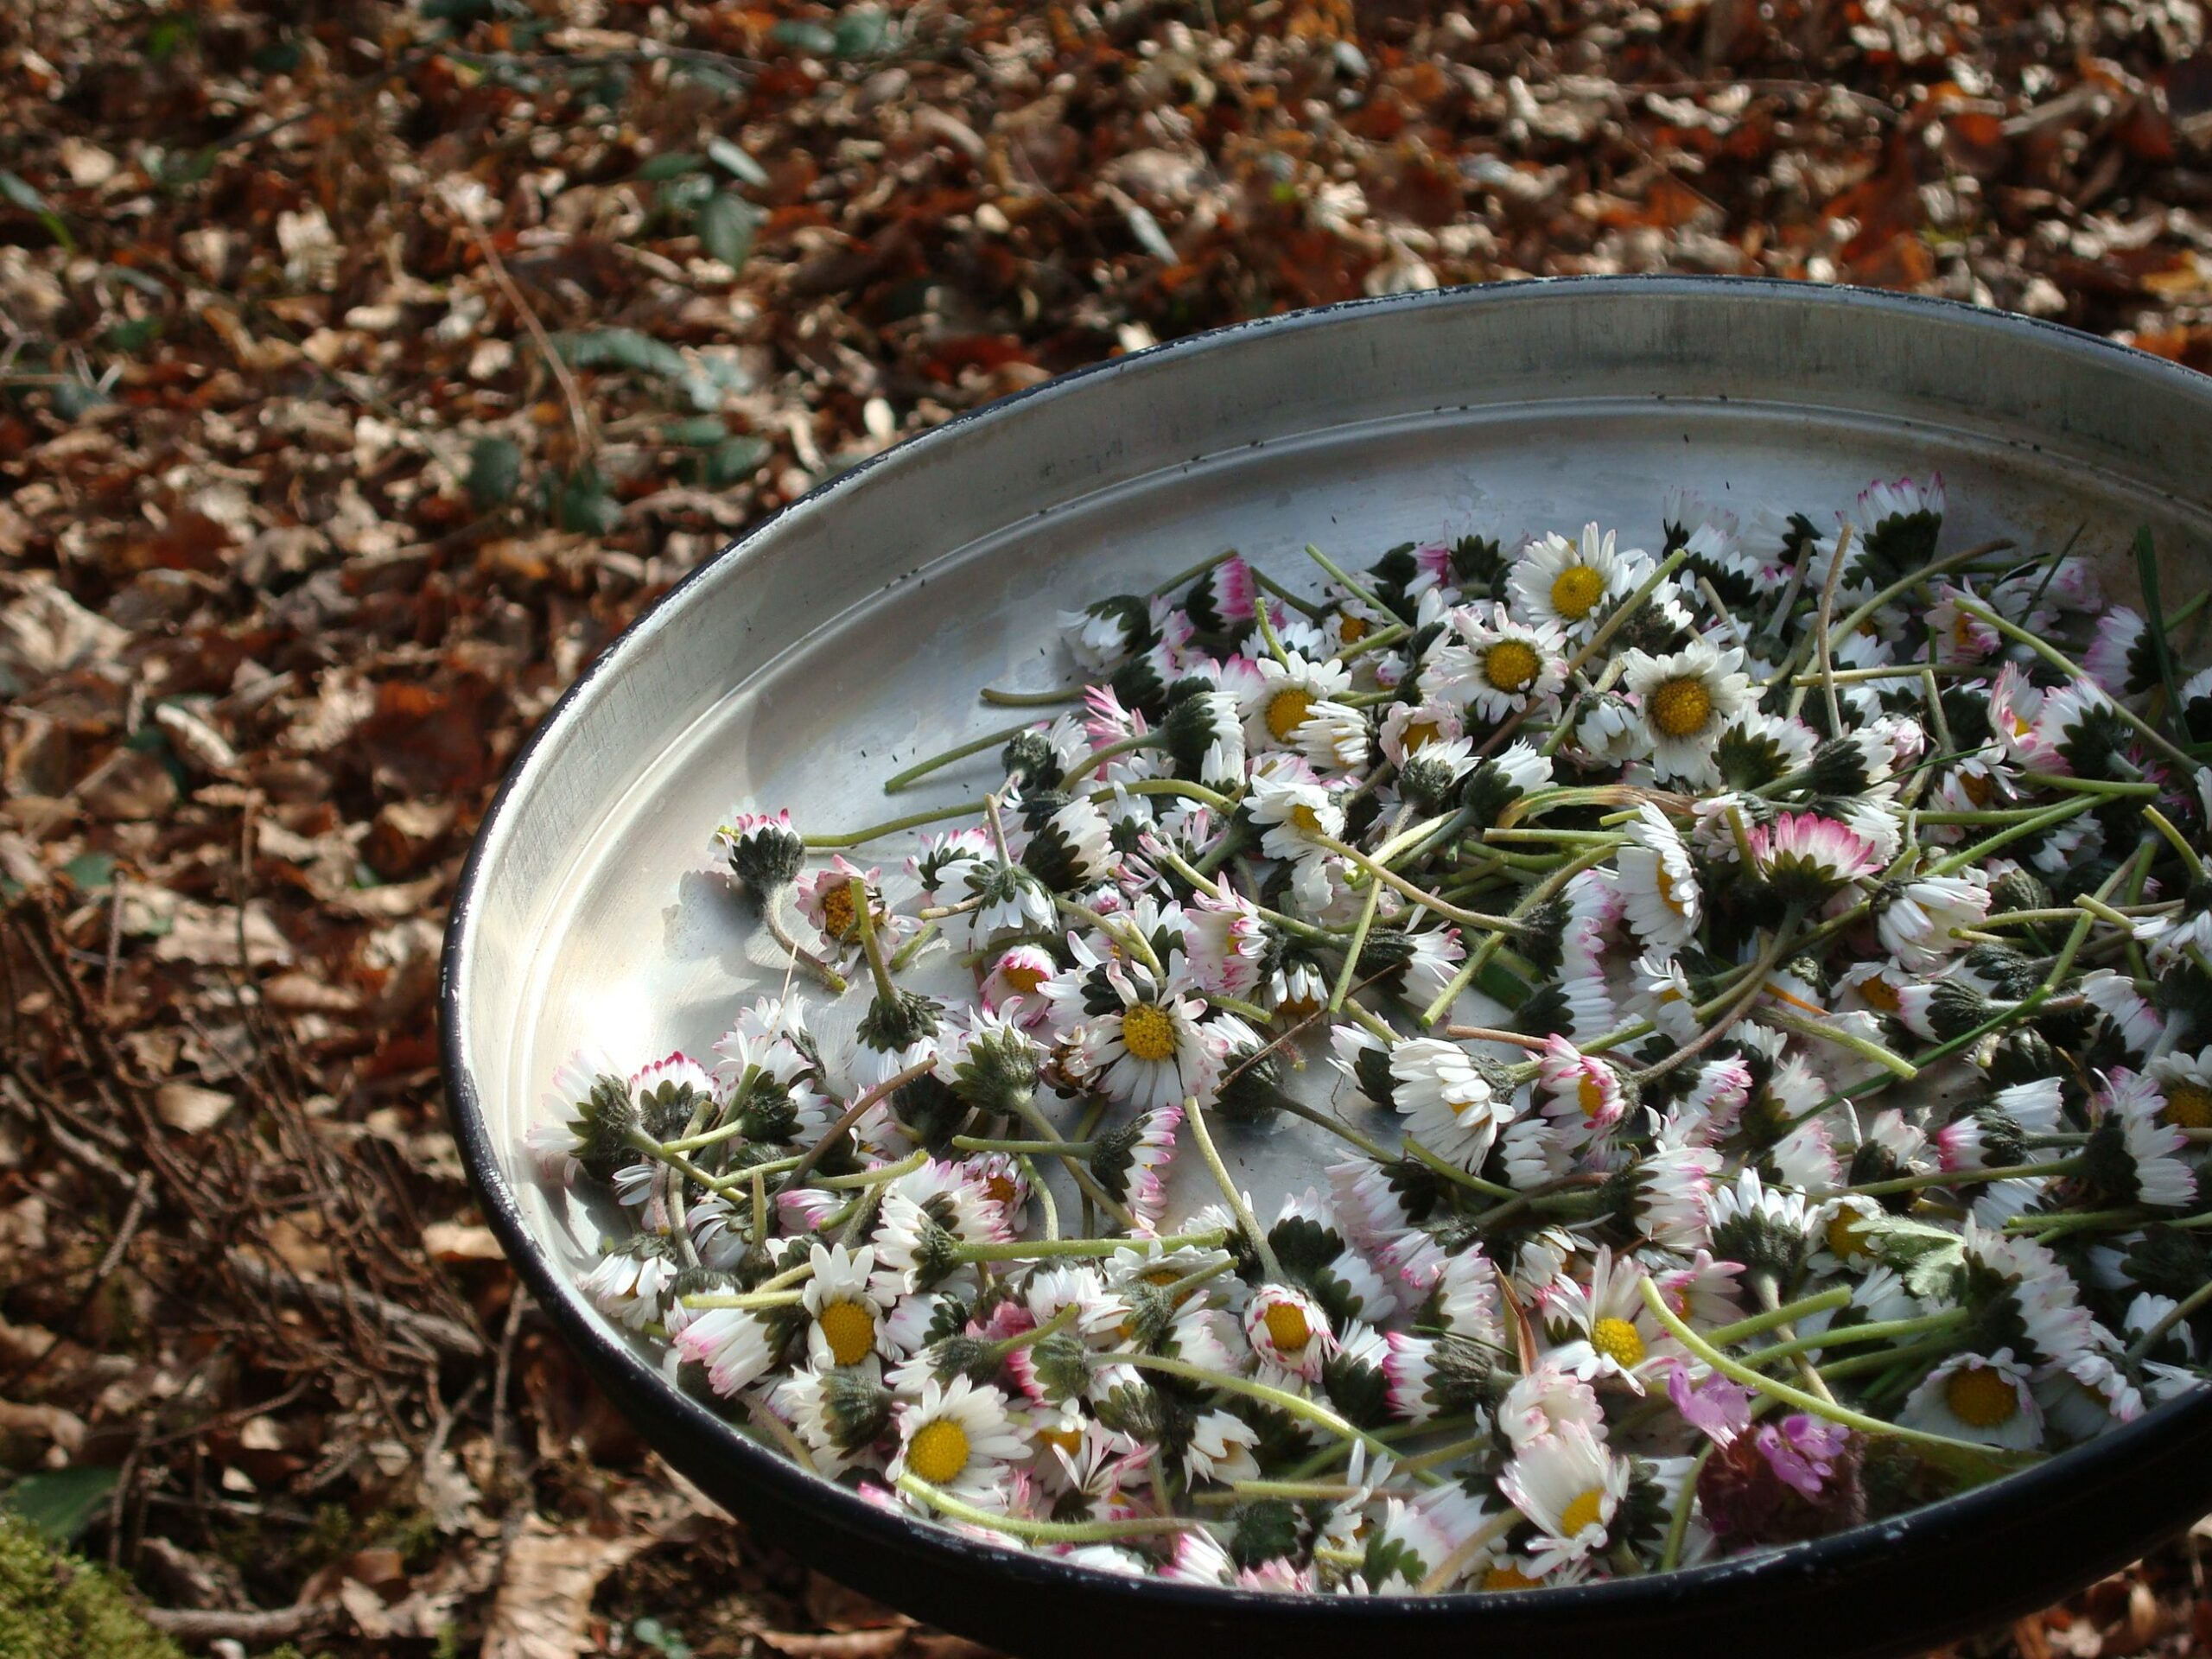 Pflanzen Gänseblümchensammmlung